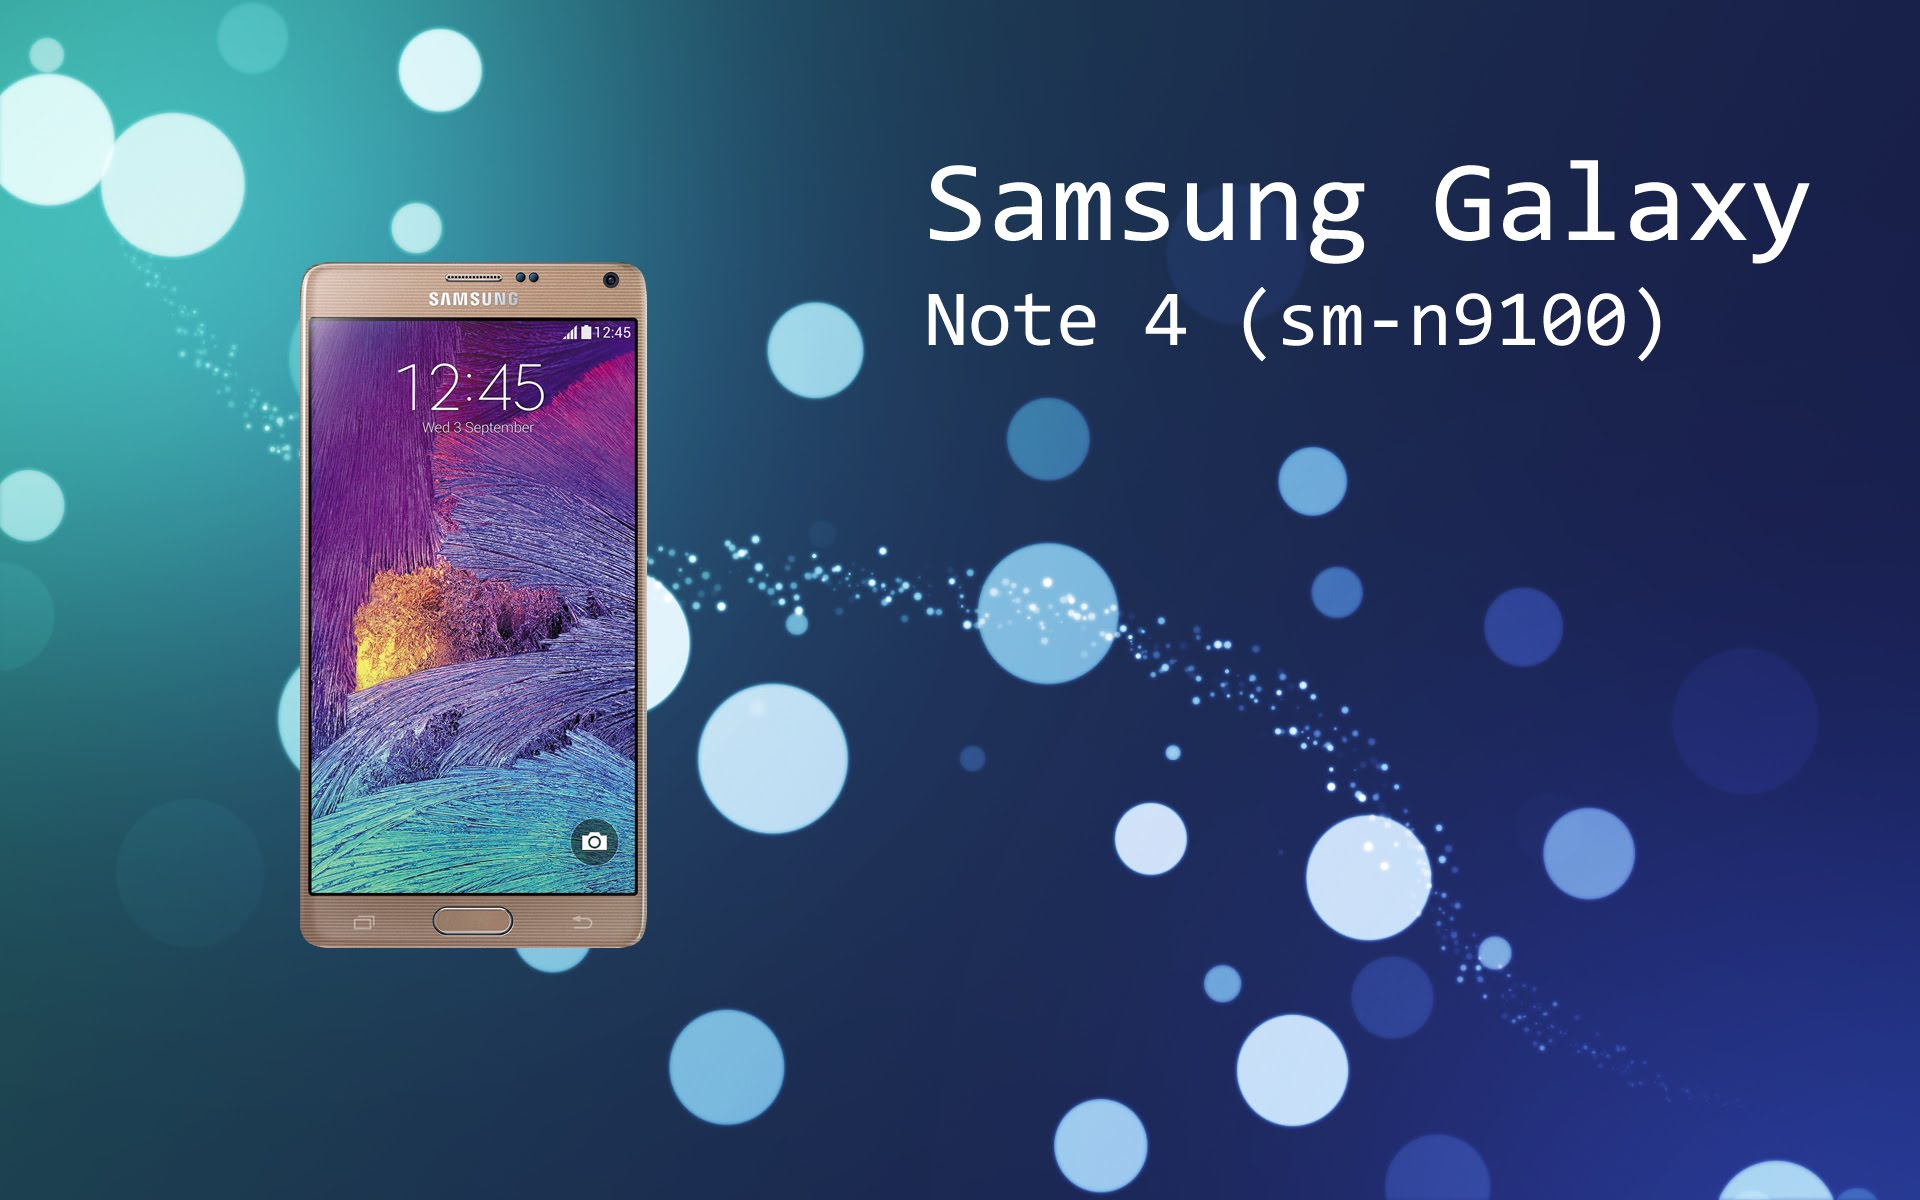 [Clone] Flash Stock Rom on Samsung Galaxy Note 4 Duos SM-n9100